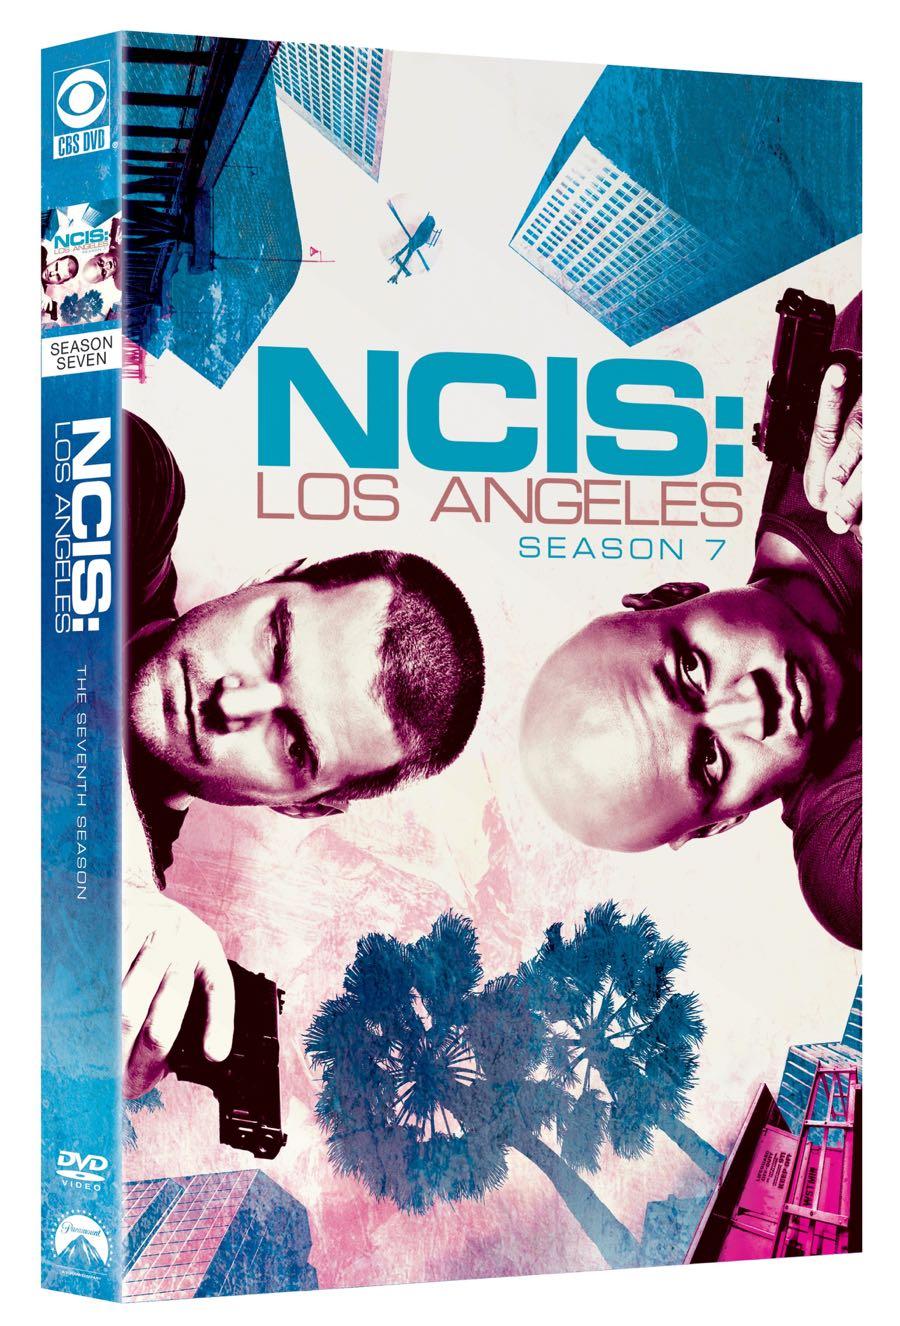 NCIS LOS ANGELES Season 7 DVD